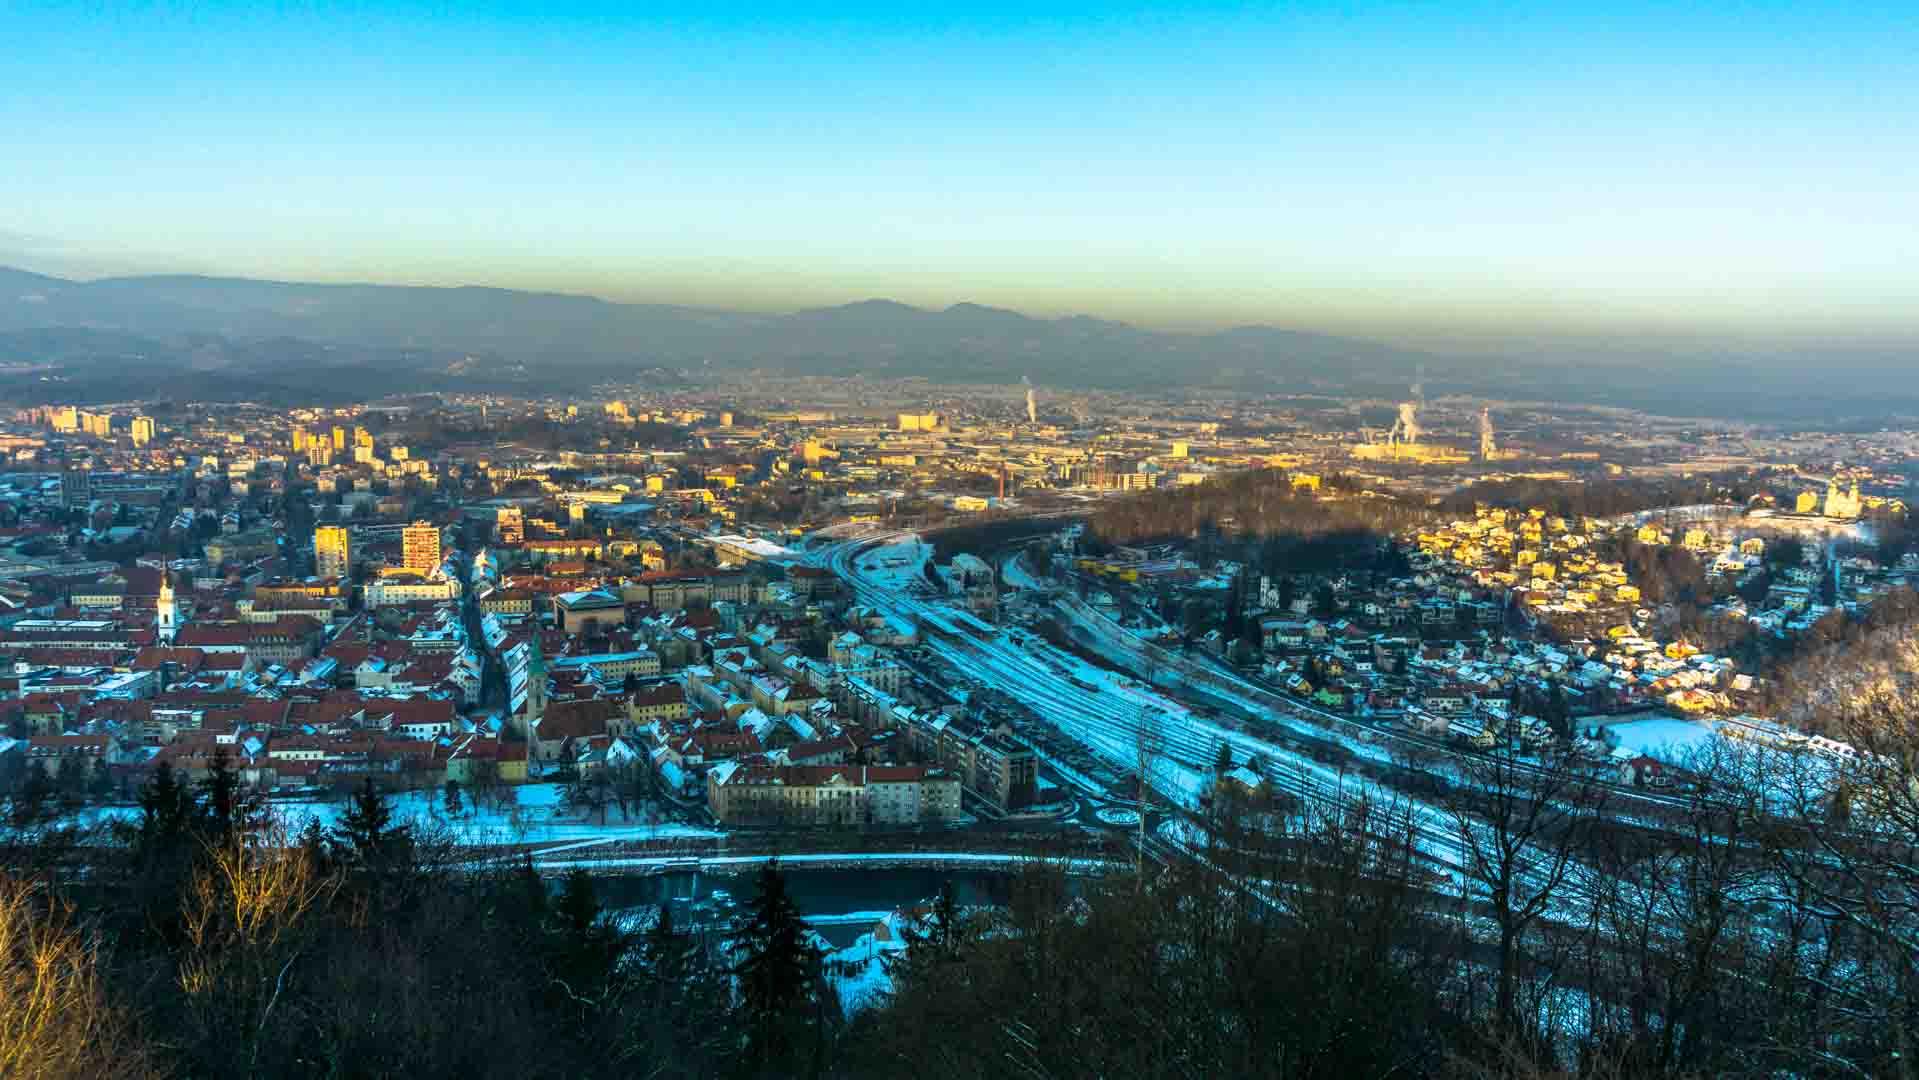 Slovenia slovénie Celje artist castle serialhikers tour du monde world trip voyage alternatif autostop hitchhiking volontariat volonteering adventure aventure